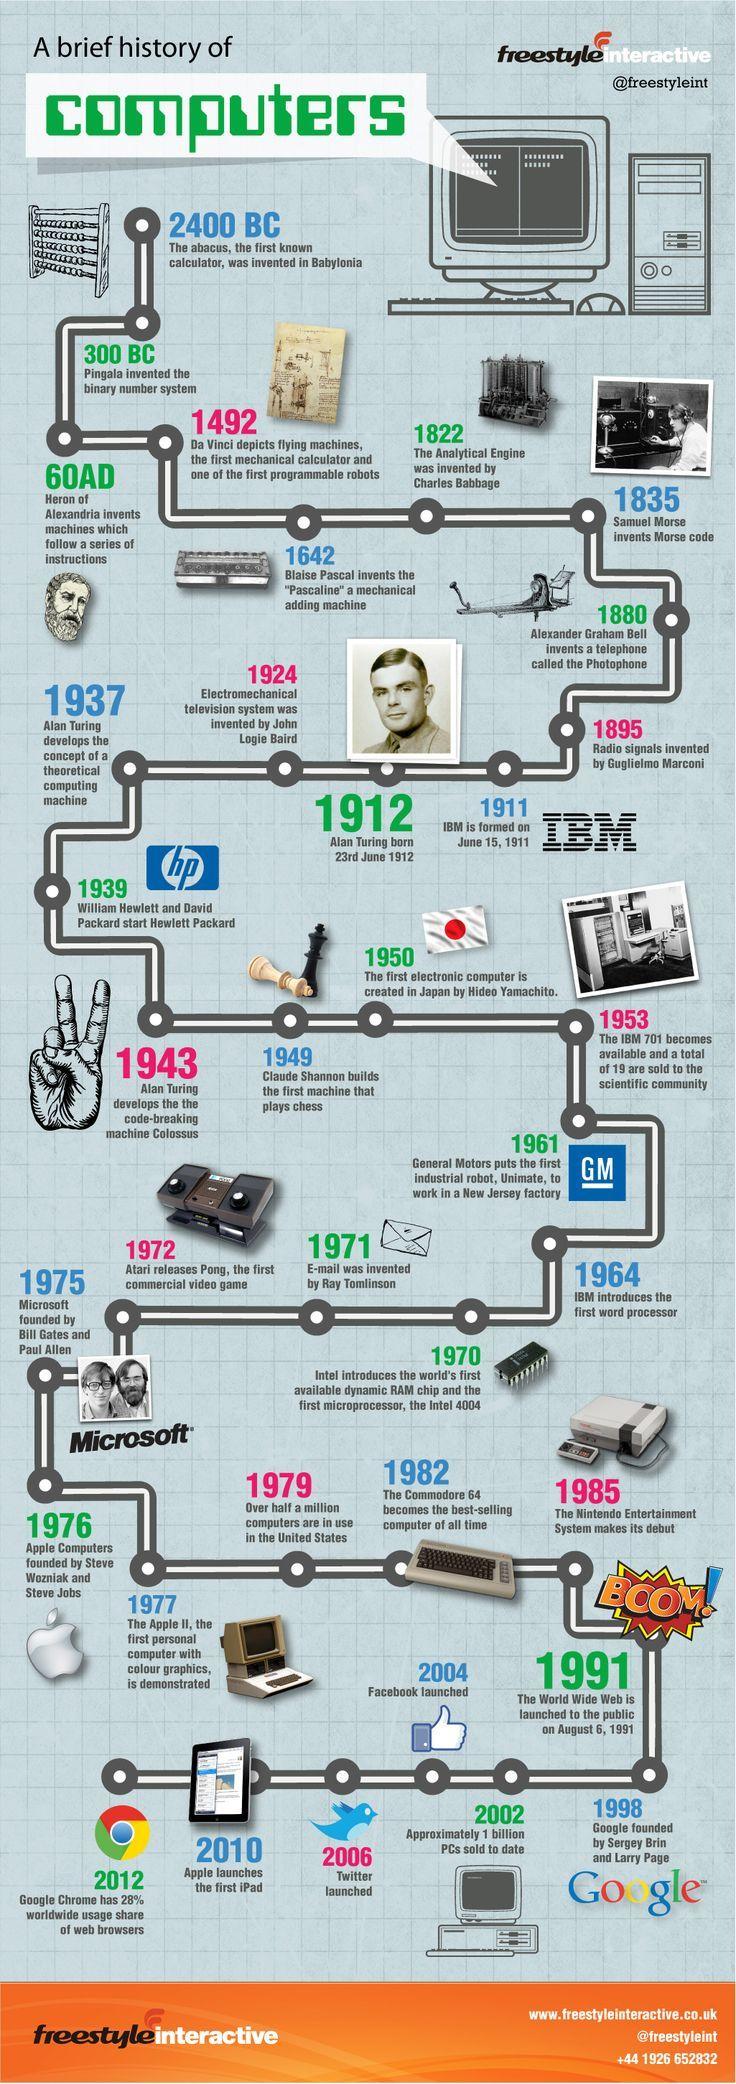 Computer's timeline | Interesting things | Pinterest | Timeline